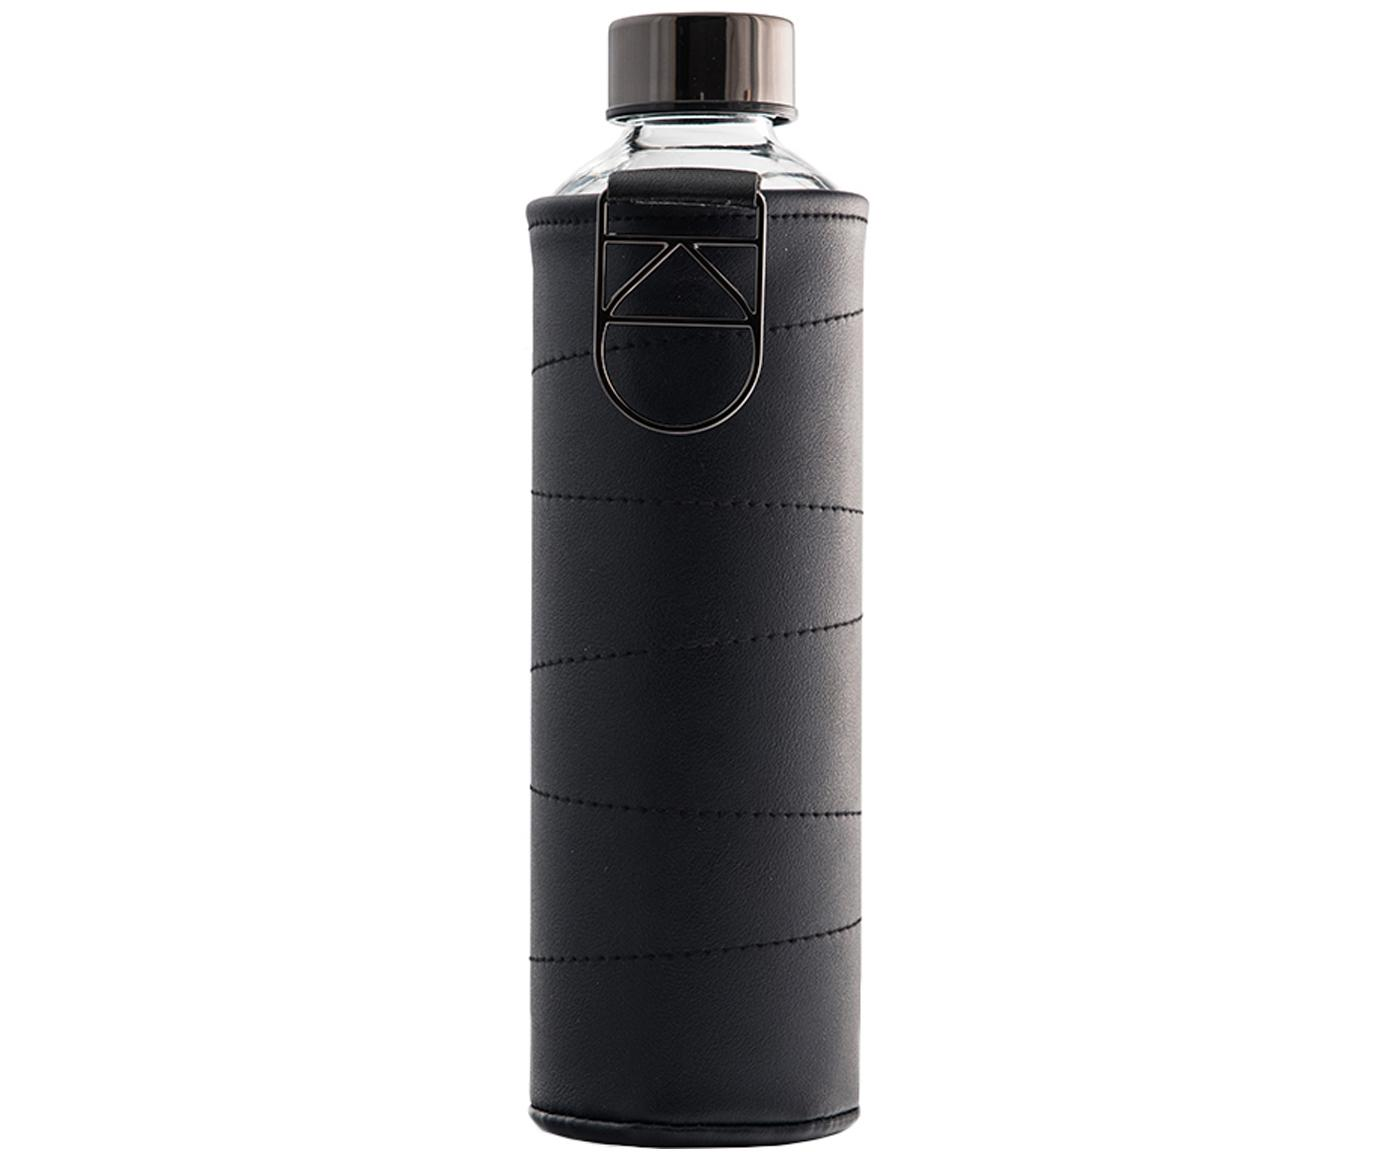 Trinkflasche Mismatch, Flasche: Borosilikatglas, Deckel: Edelstahl, Tritan, Siliko, Bezug: Kunstleder, Schwarz, Transparent, Ø 8 x H 26 cm